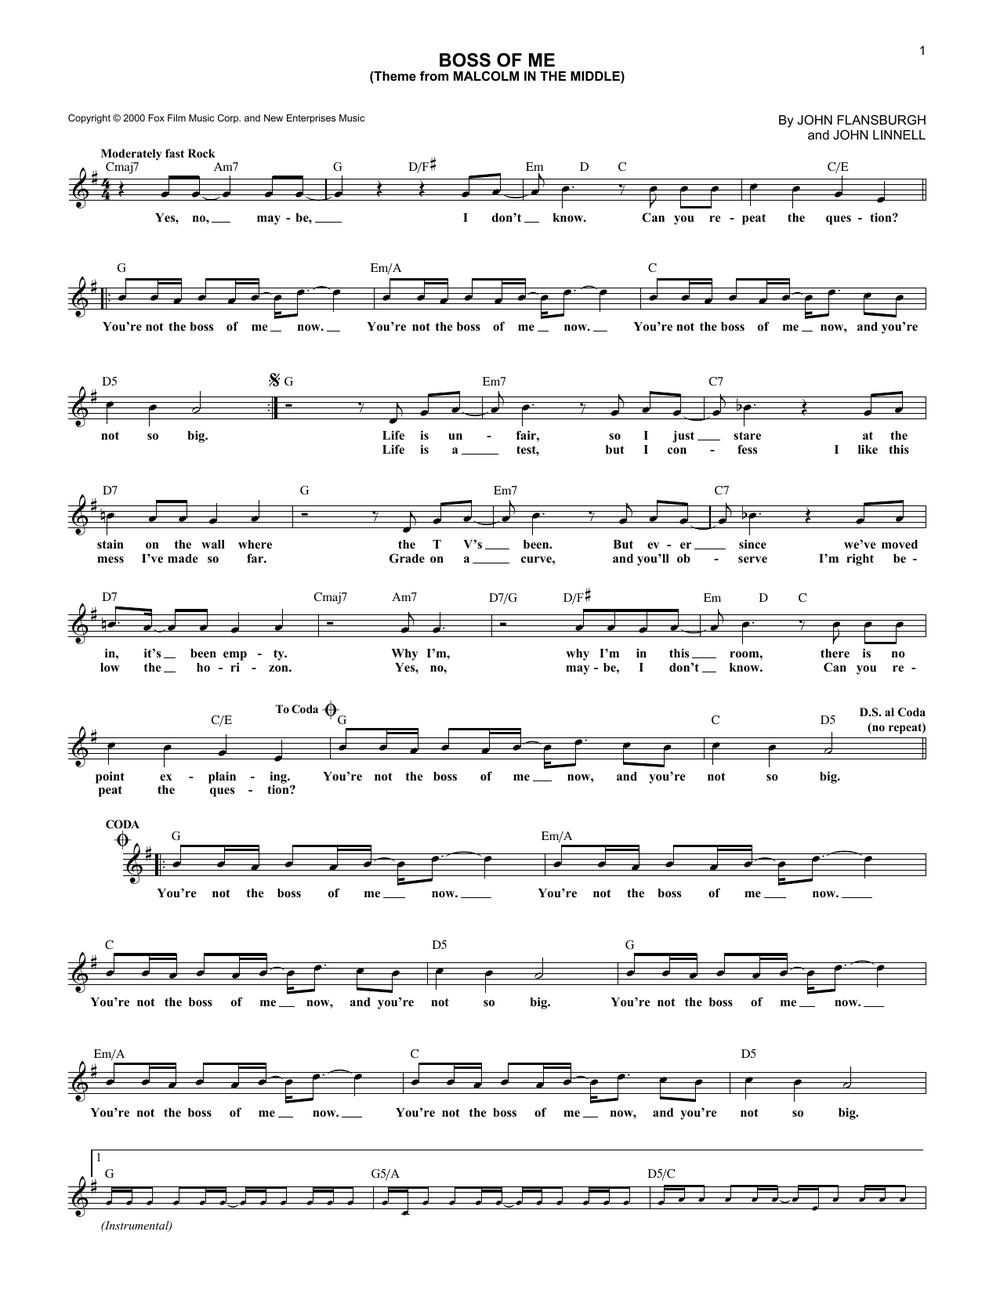 Boss of Me sheet music.png